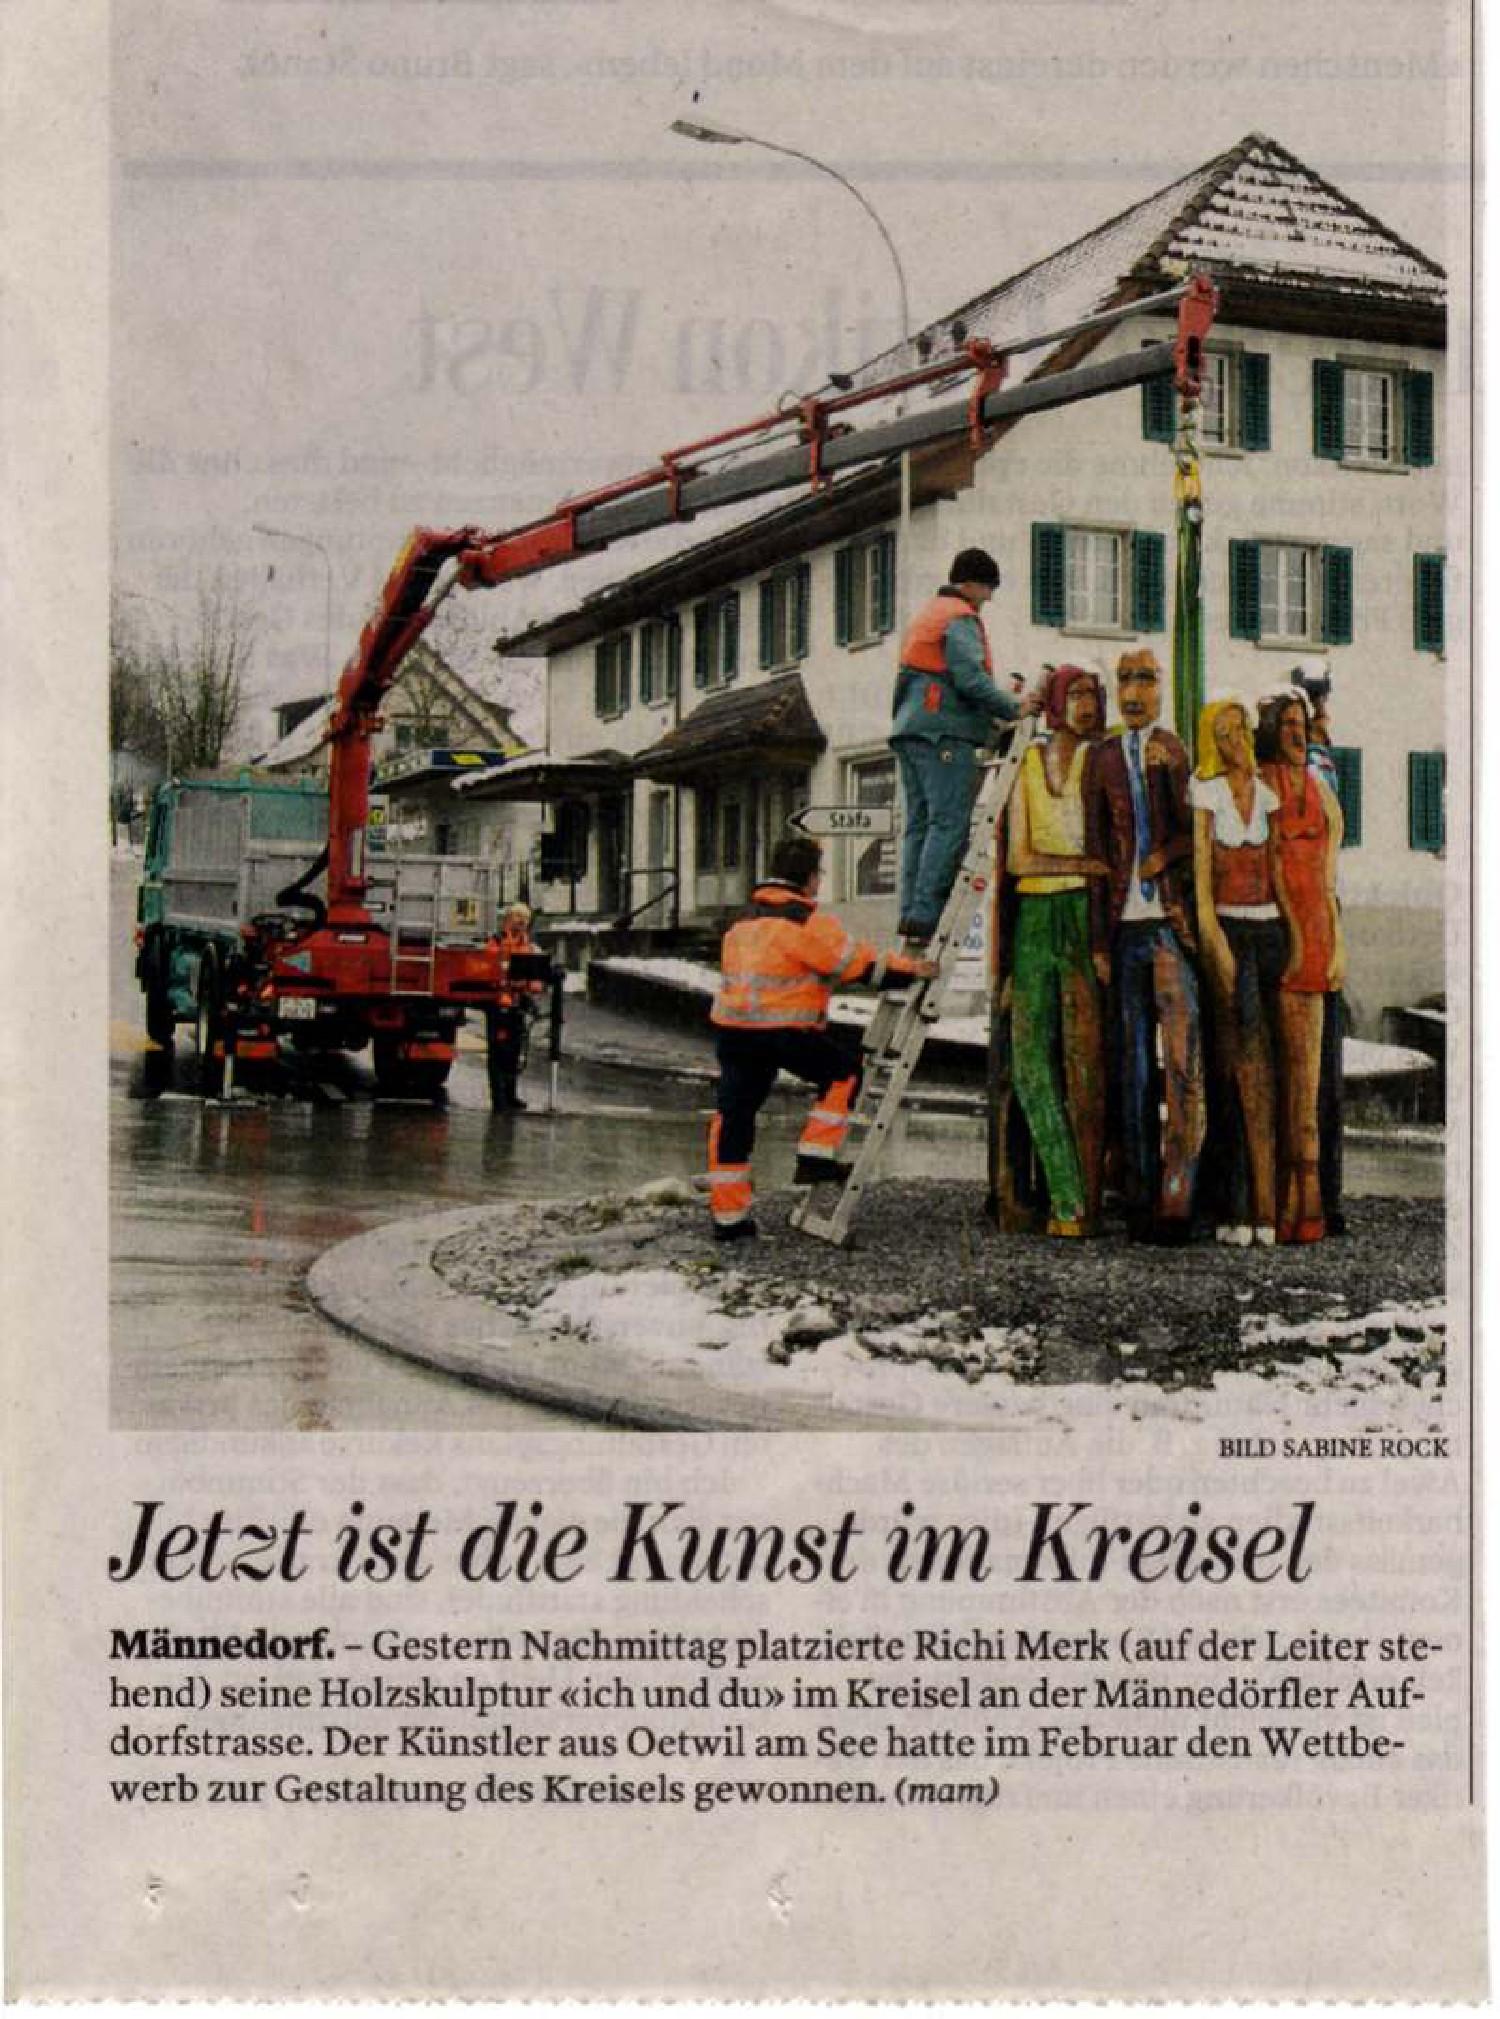 Tages-Anzeiger 19. April 2007